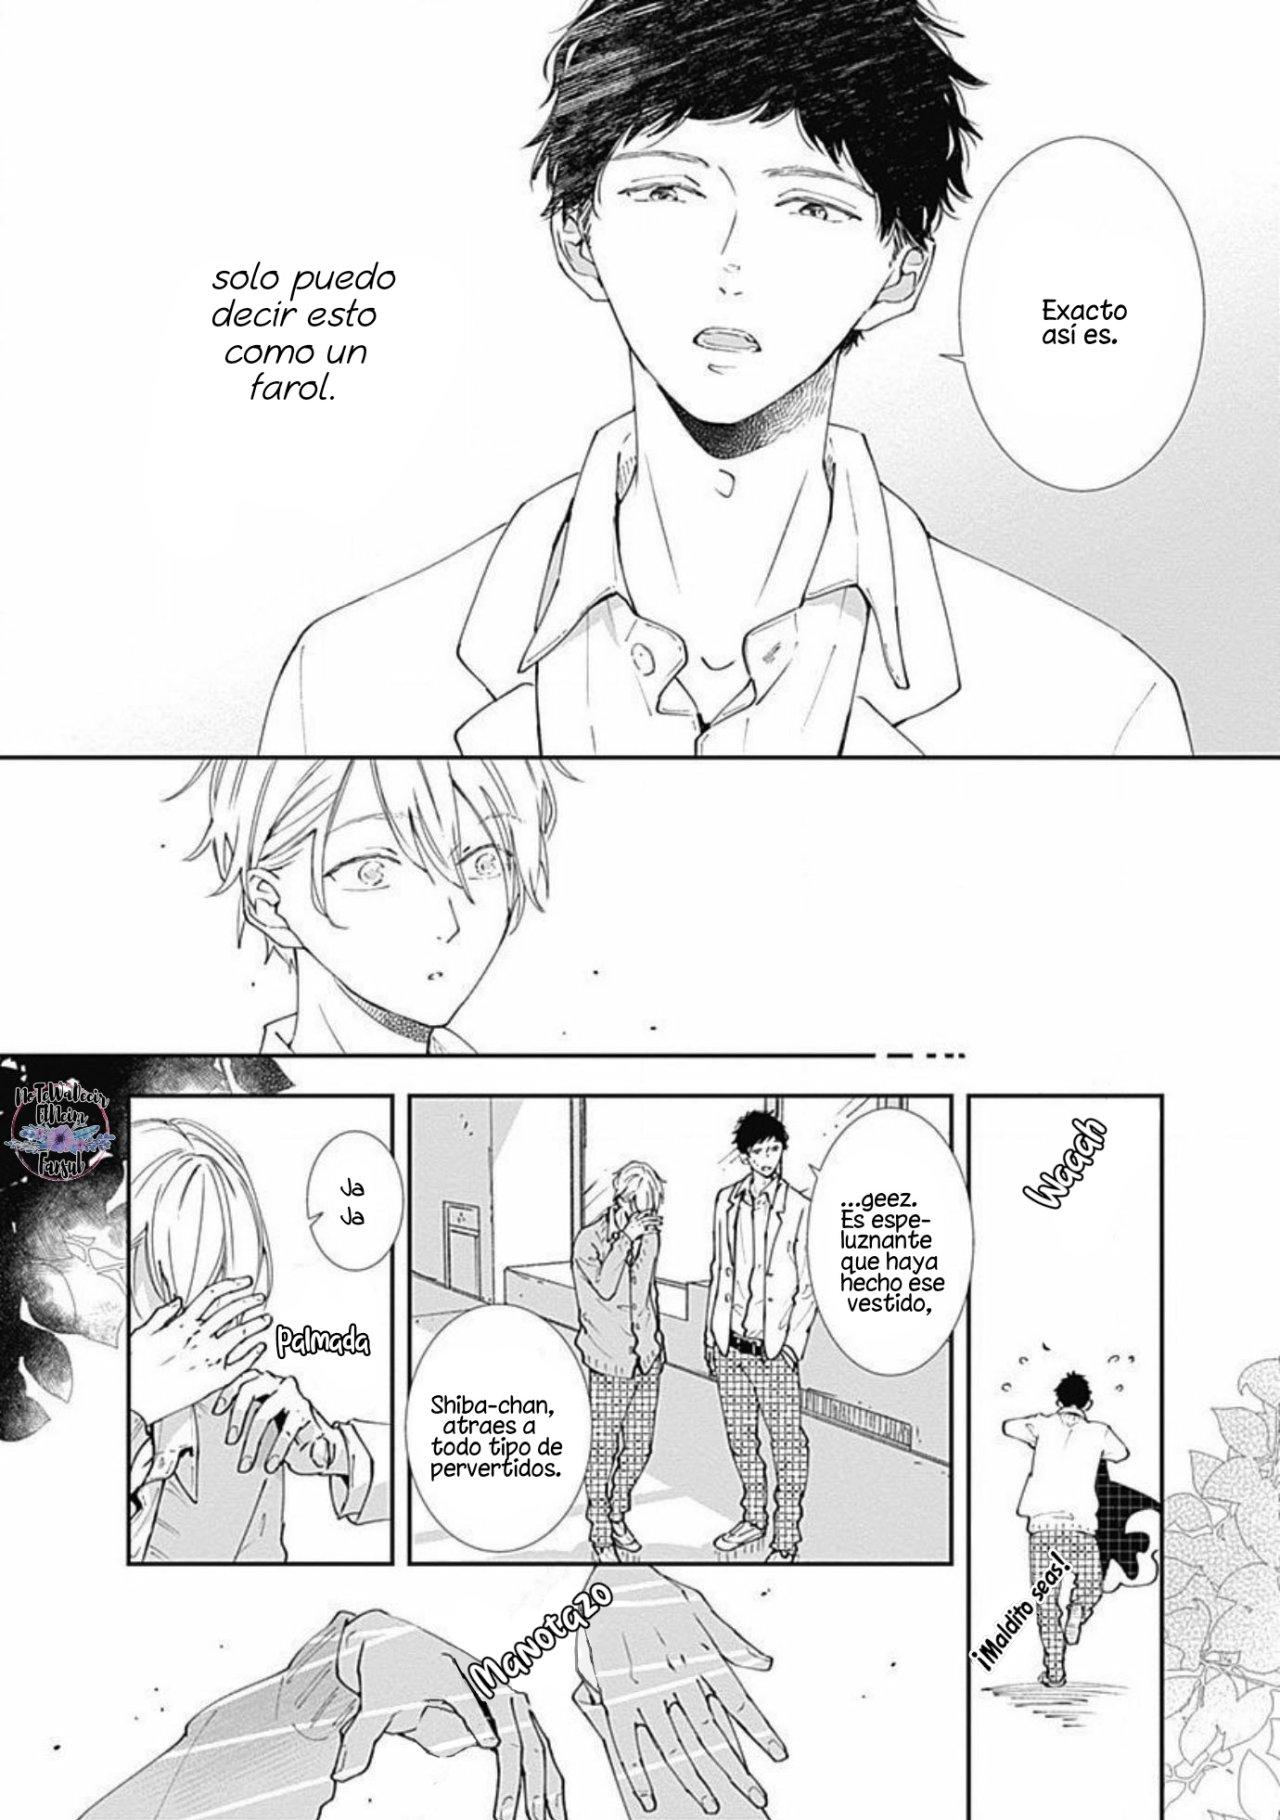 https://nine.mangadogs.com/es_manga/pic8/12/36684/946997/6c18befe0fcf6ac9f40181024d2dfd09.jpg Page 23